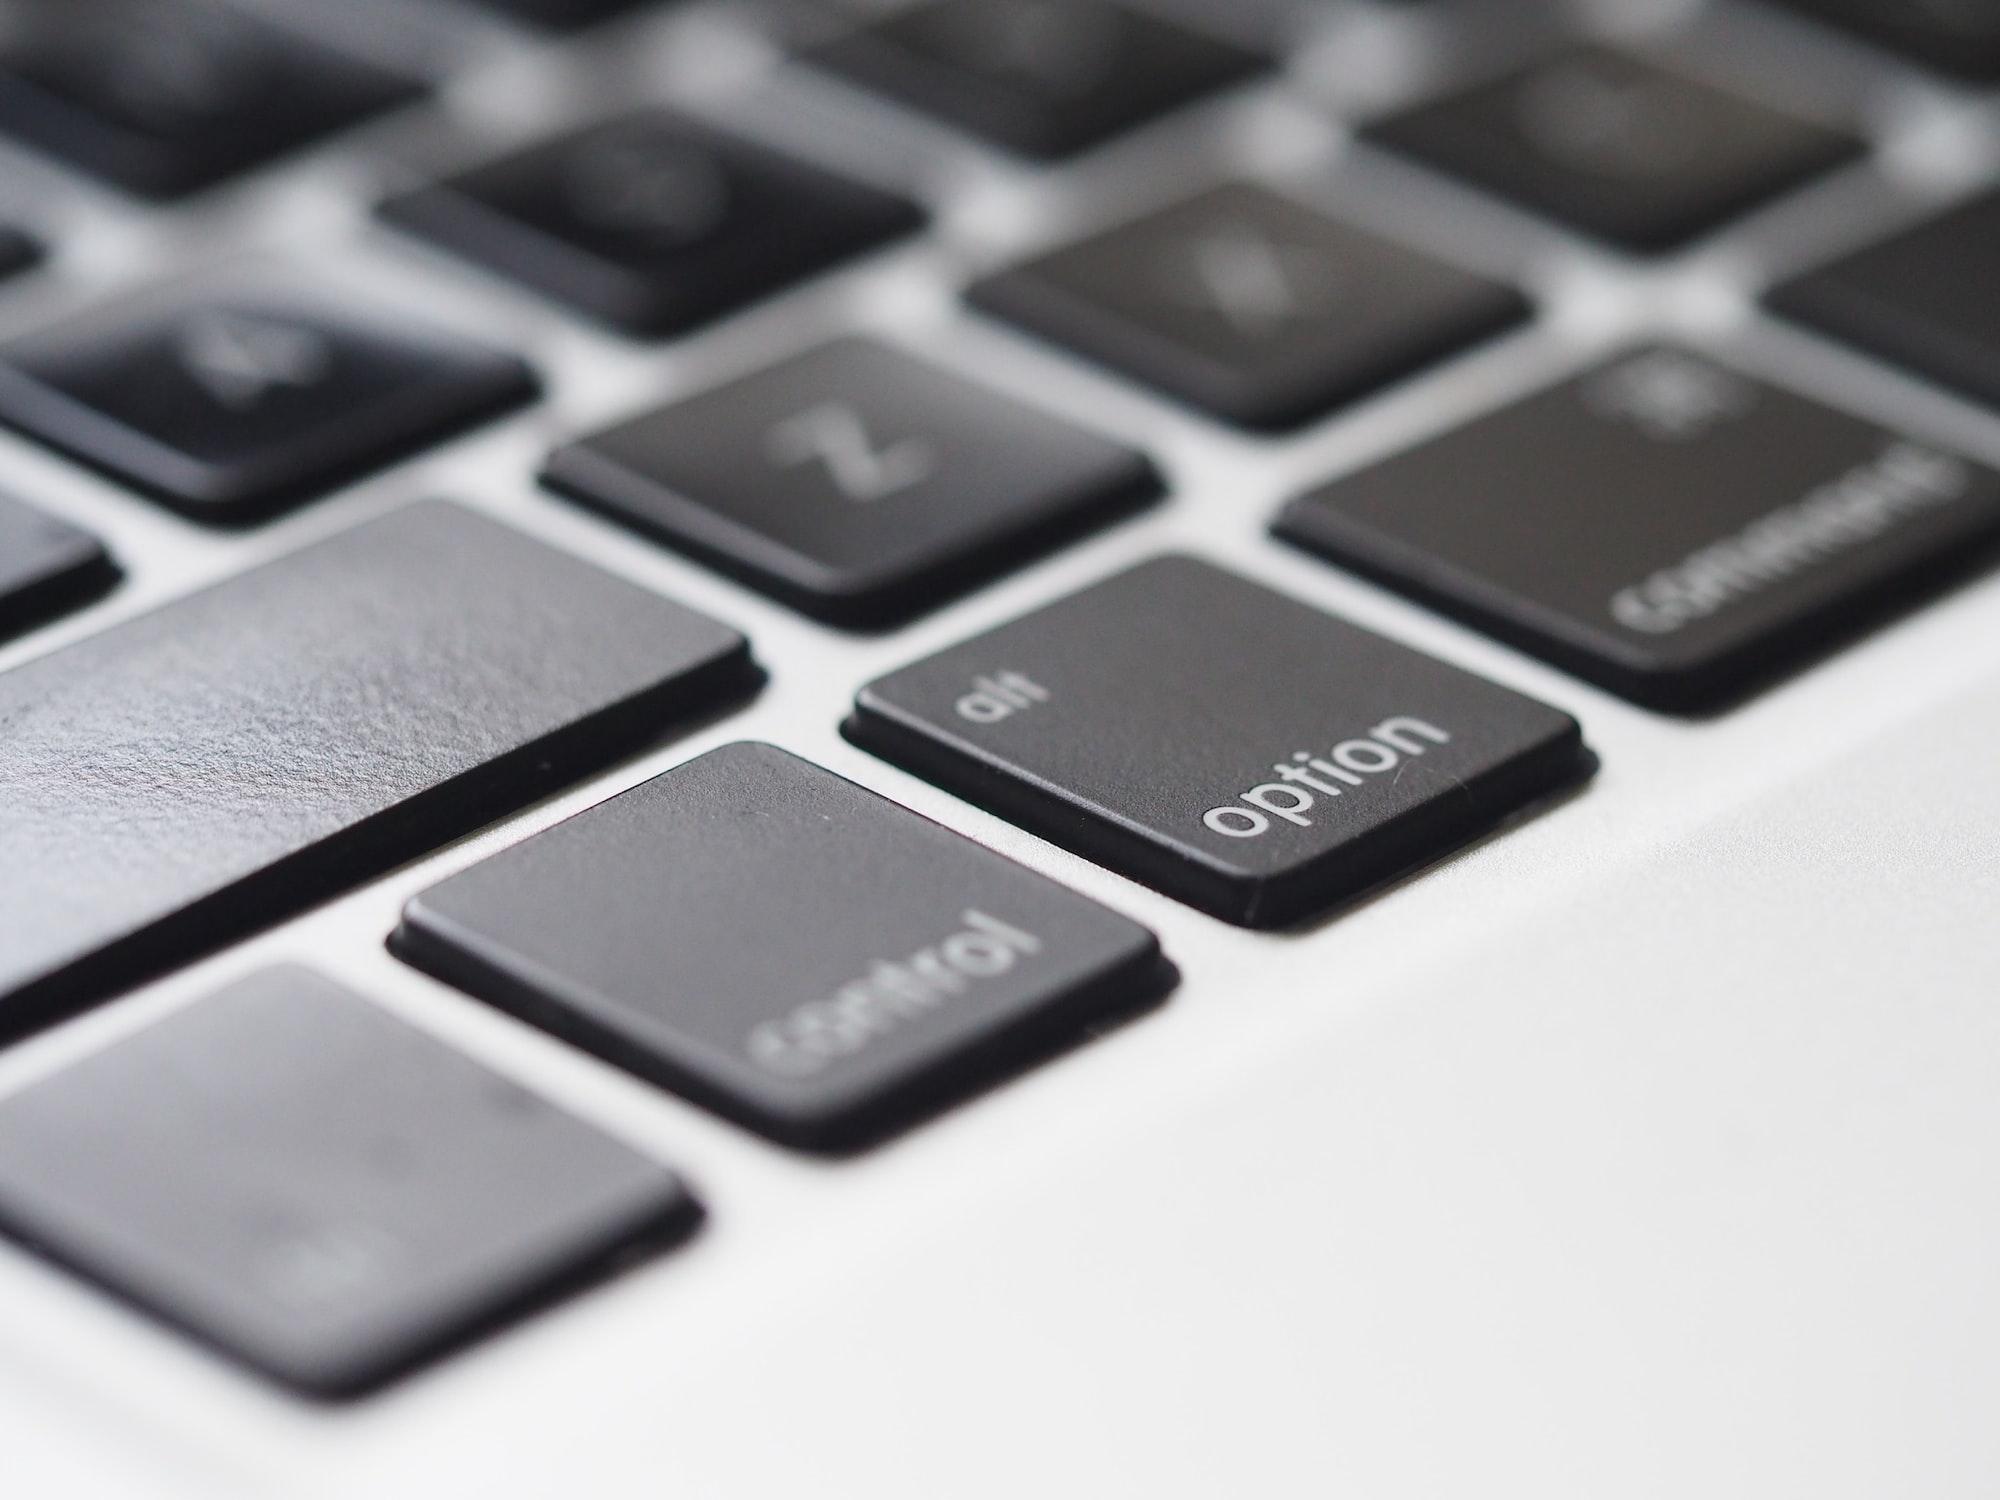 Optional keyboard